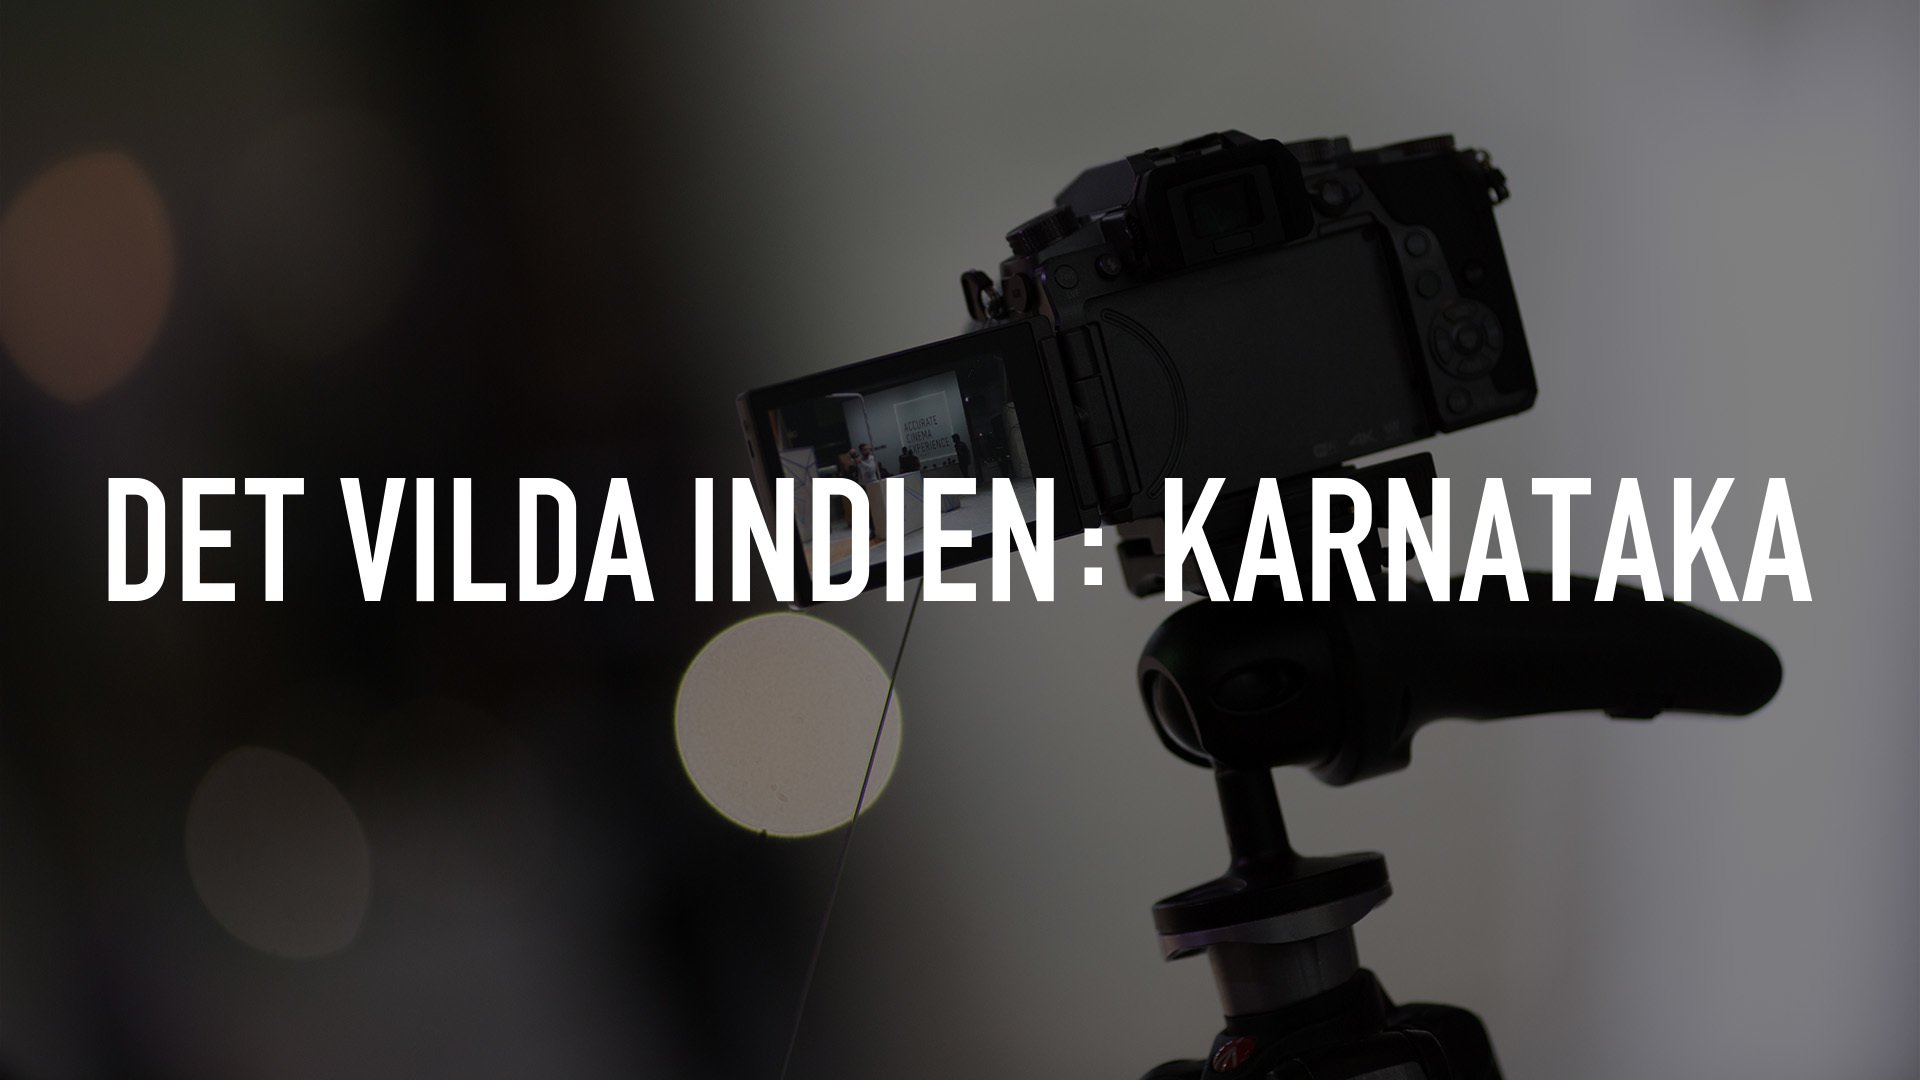 Det vilda Indien: Karnataka